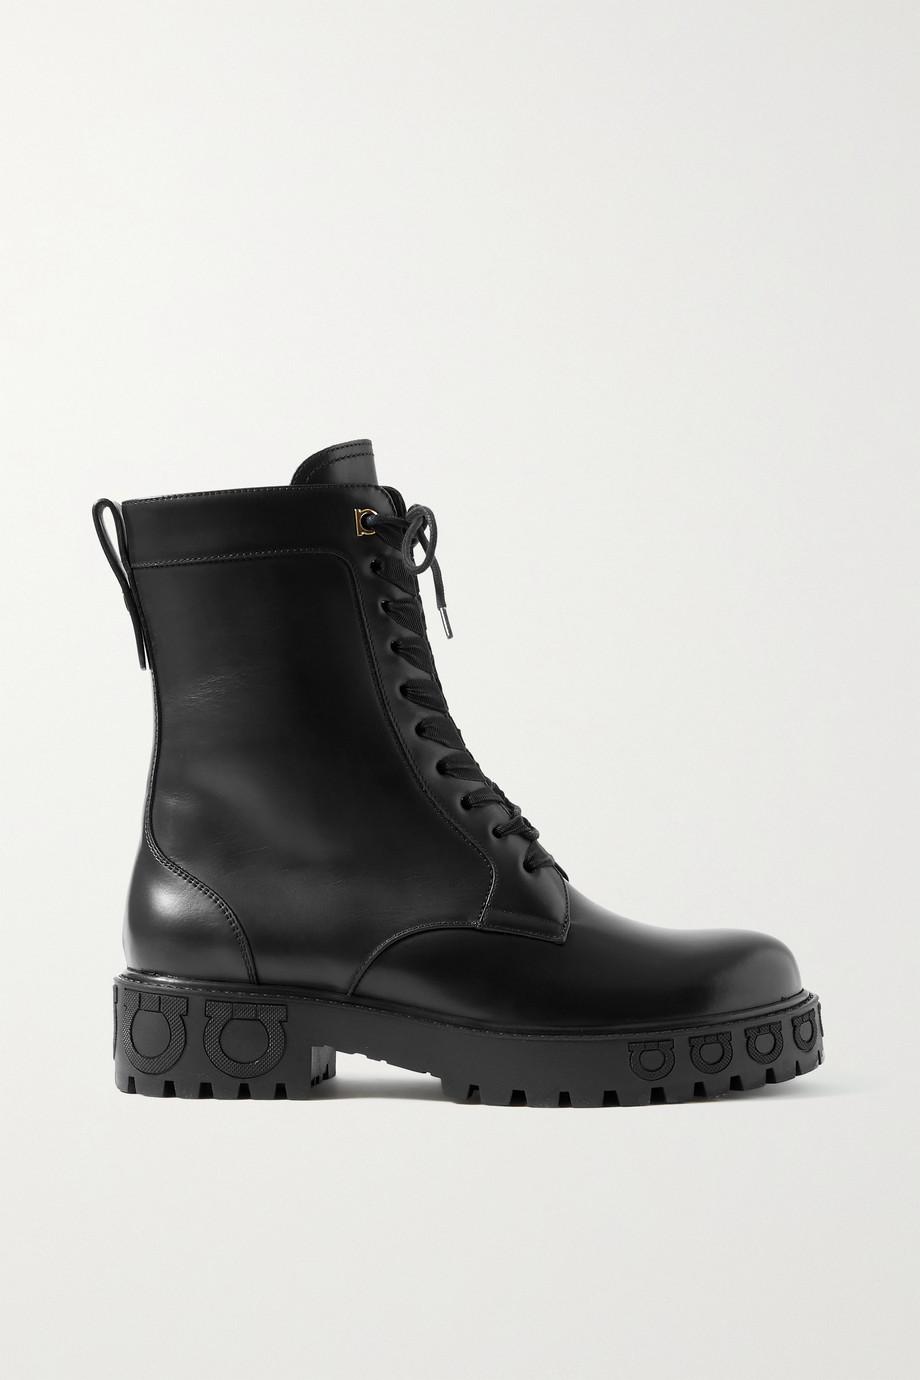 Salvatore Ferragamo Chopper leather ankle boots